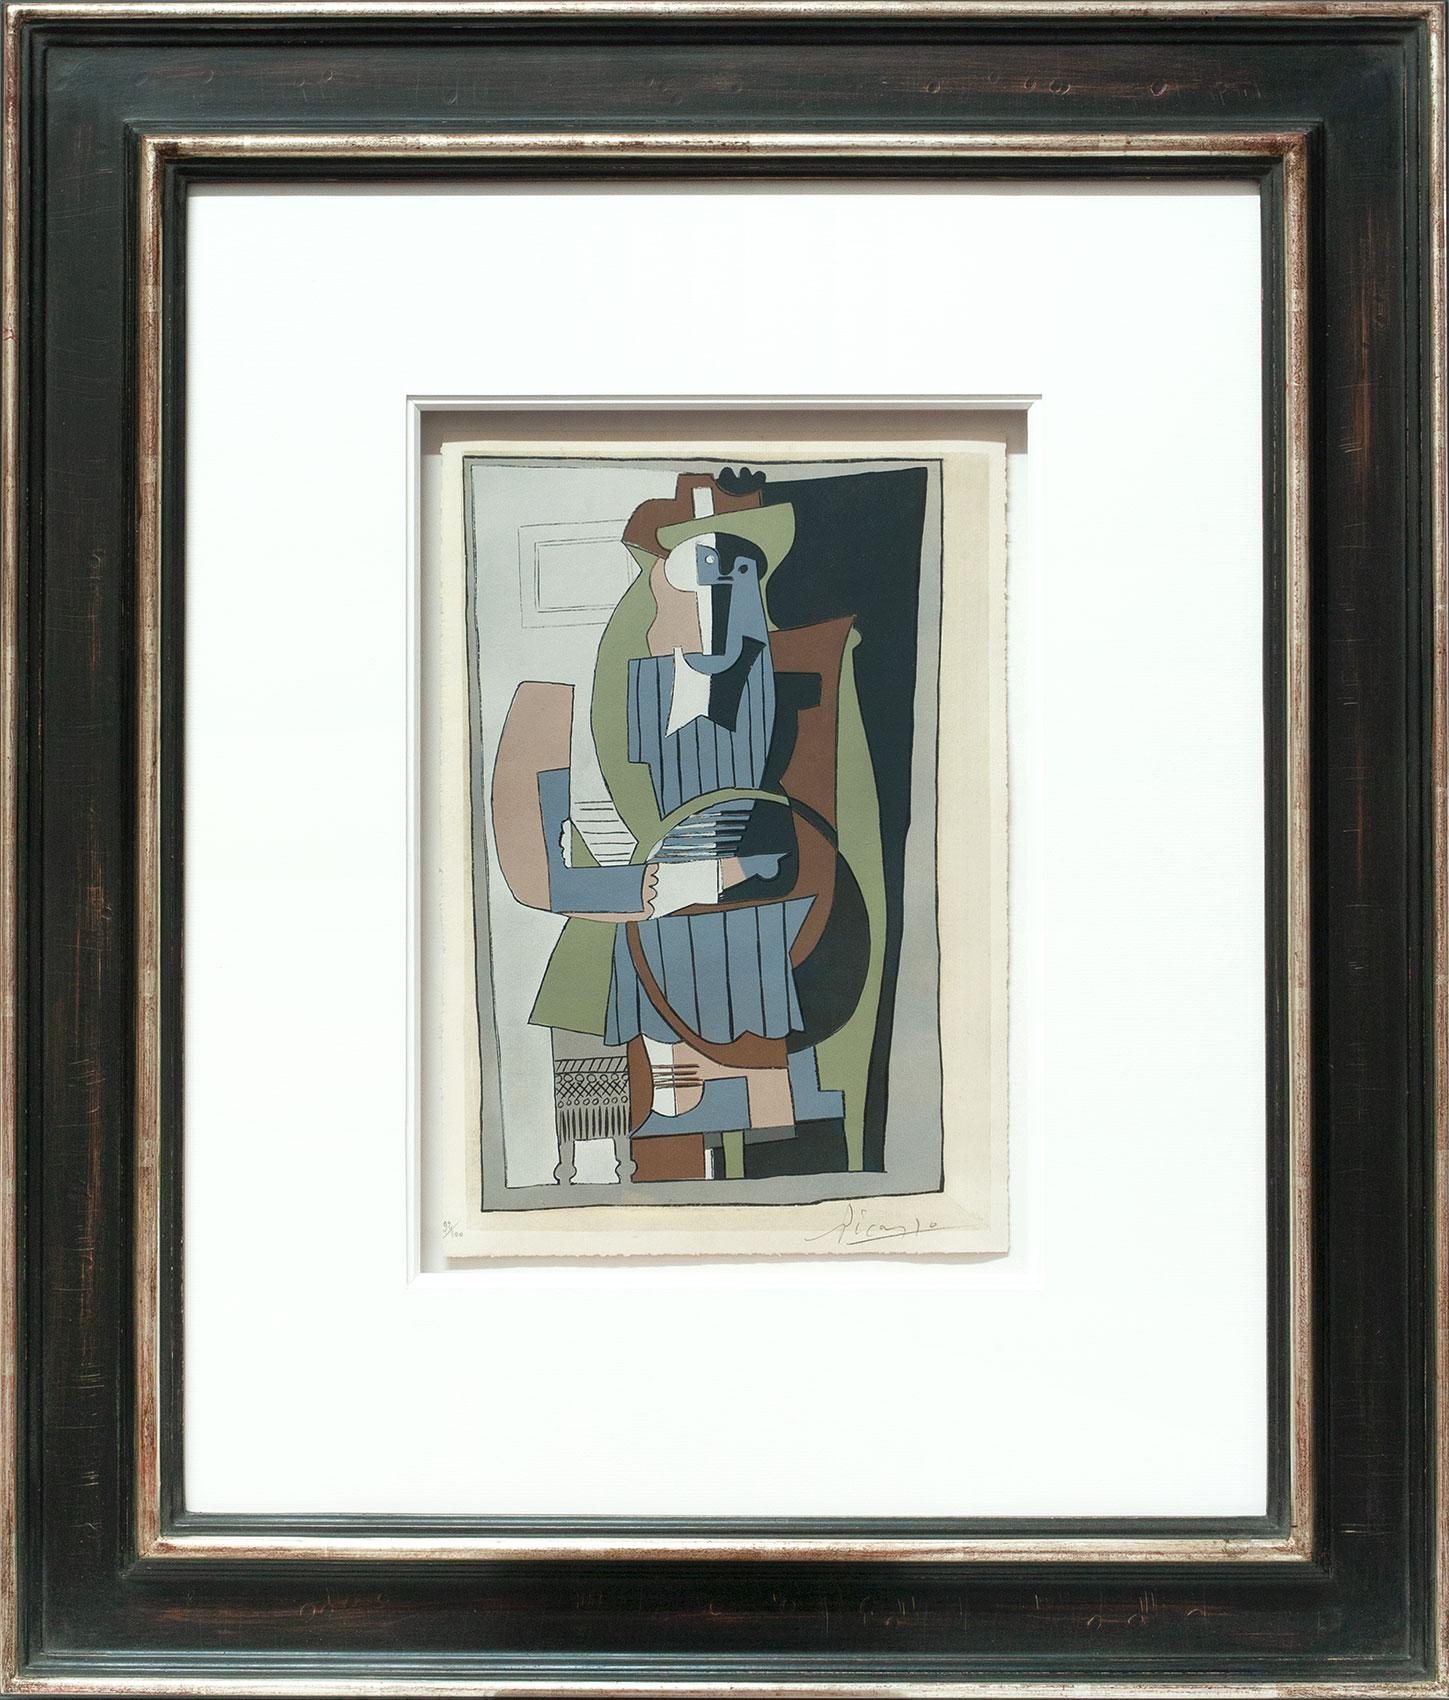 Pablo Picasso «Arlequin et guitare» Galerie Française